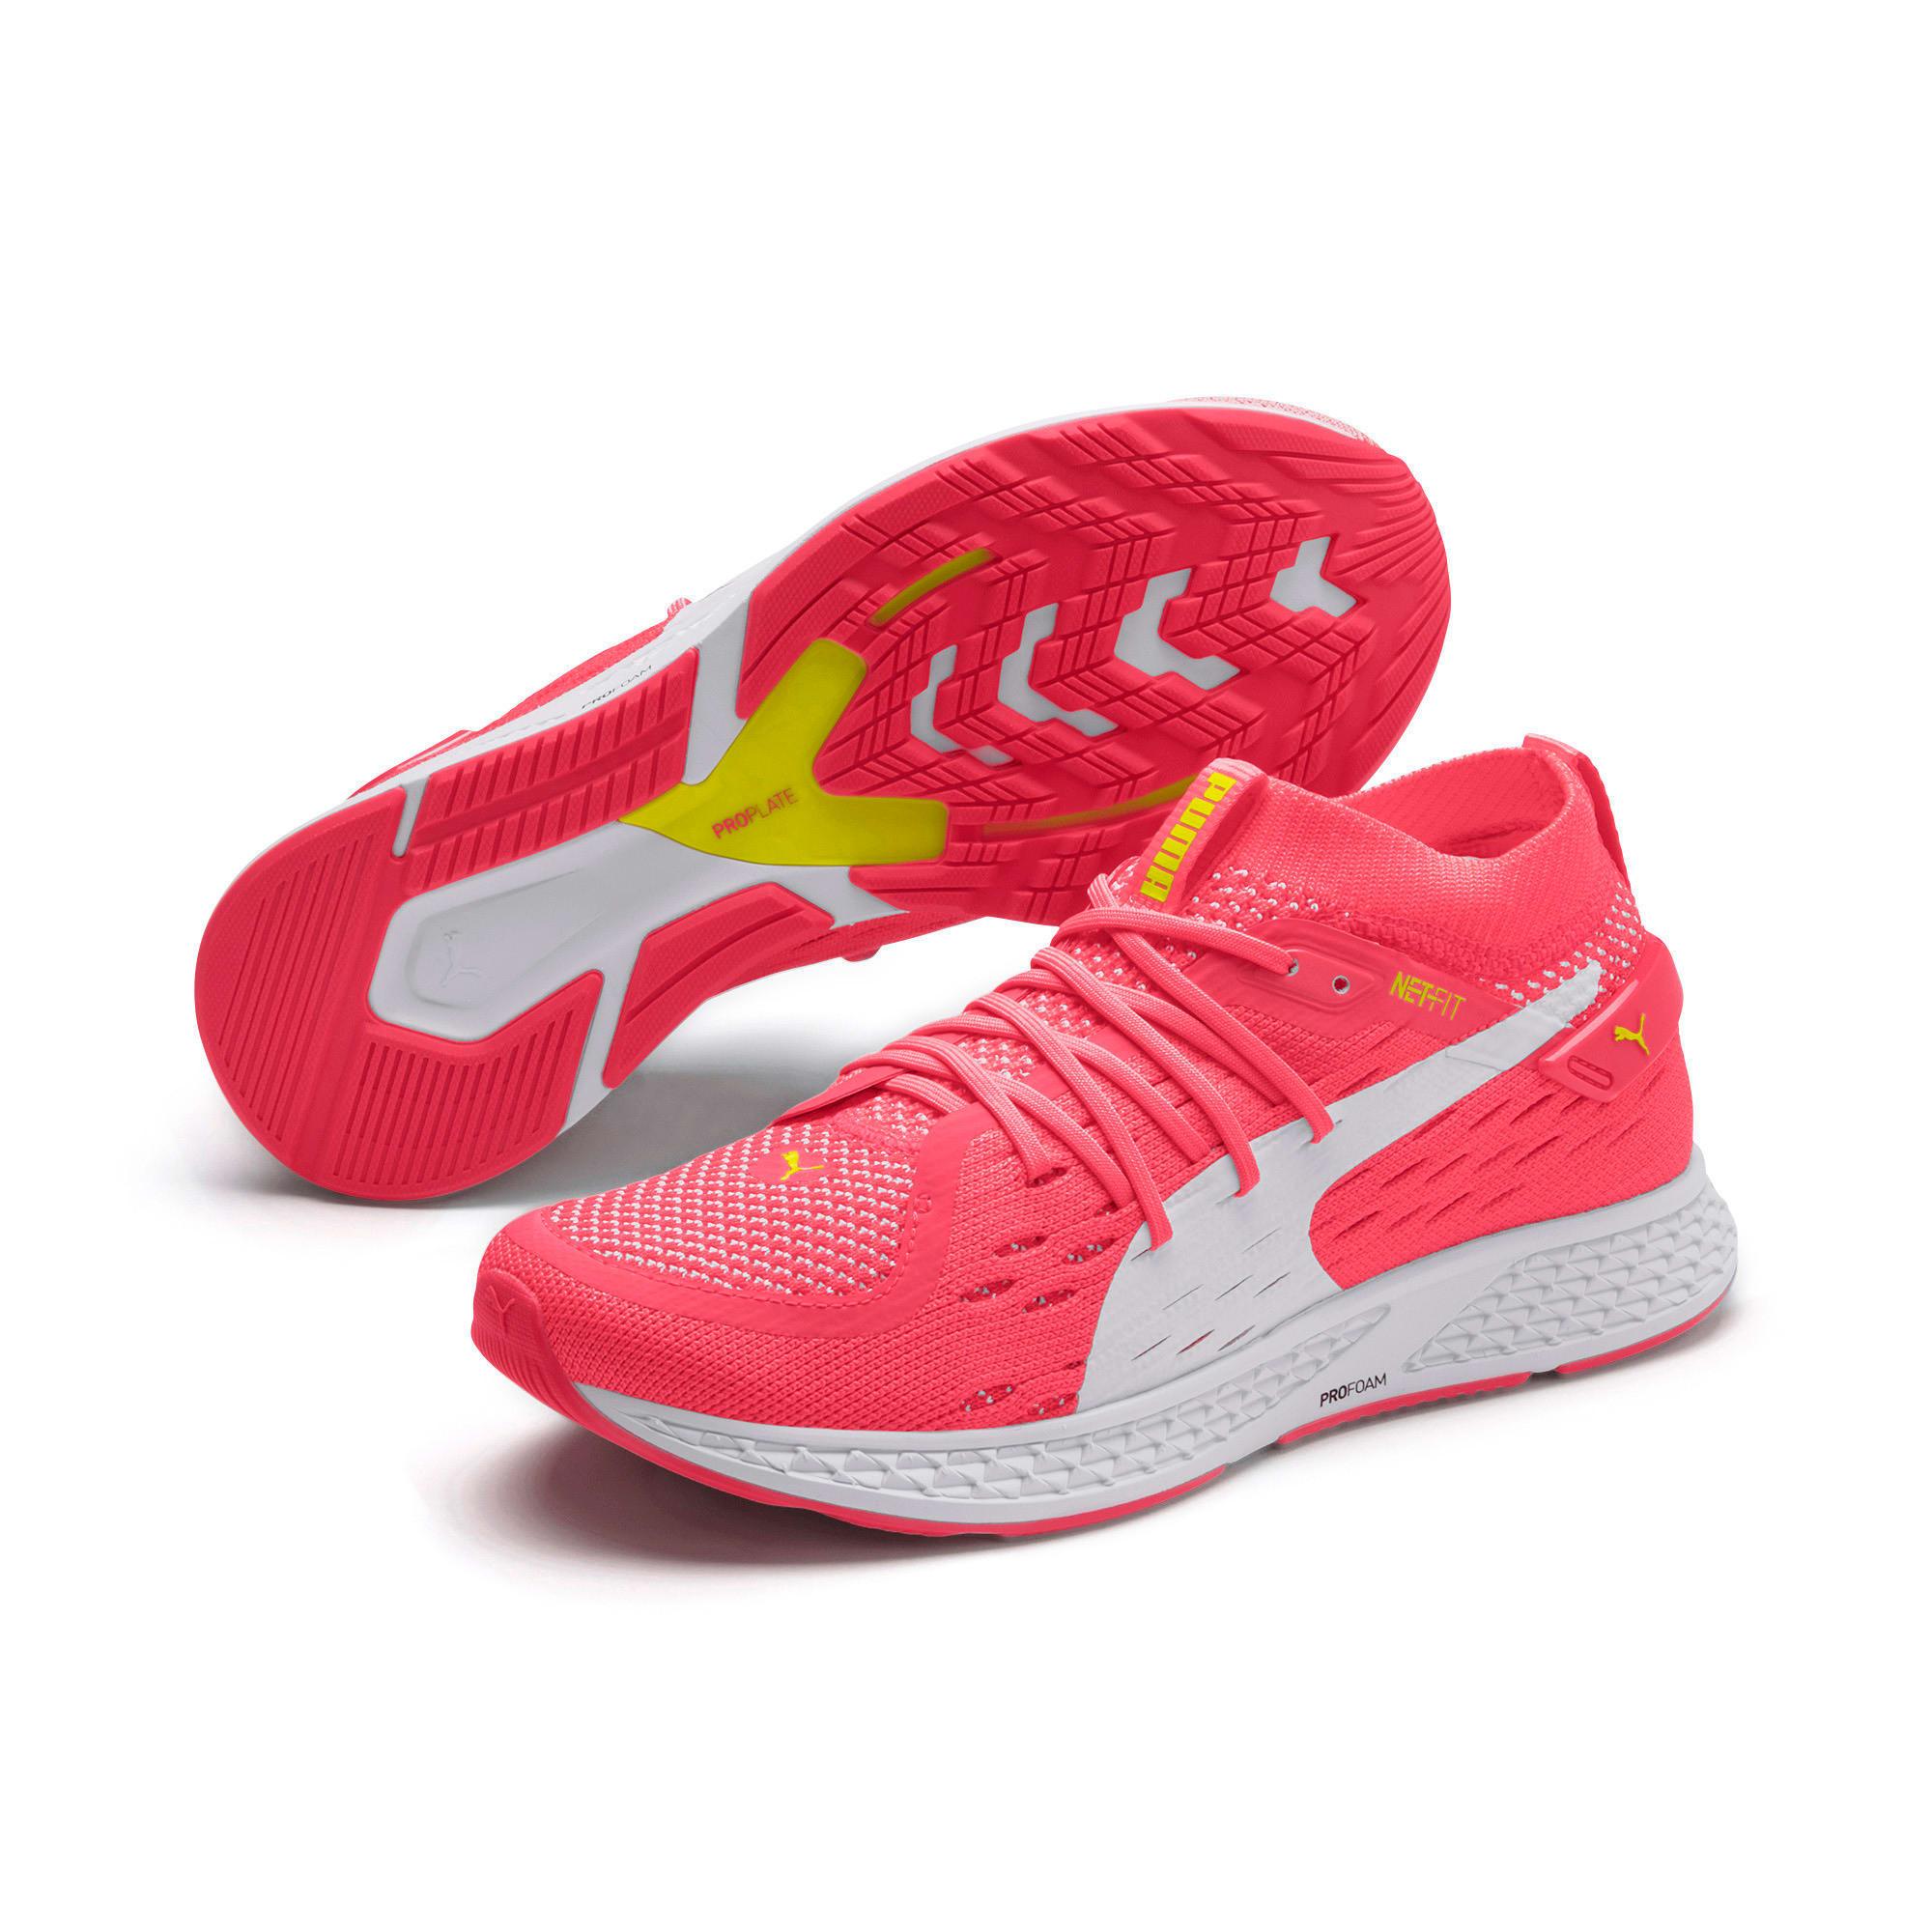 Miniatura 2 de Zapatos para correrSPEED500 para mujer, Pink Alert-White-Yellow, mediano